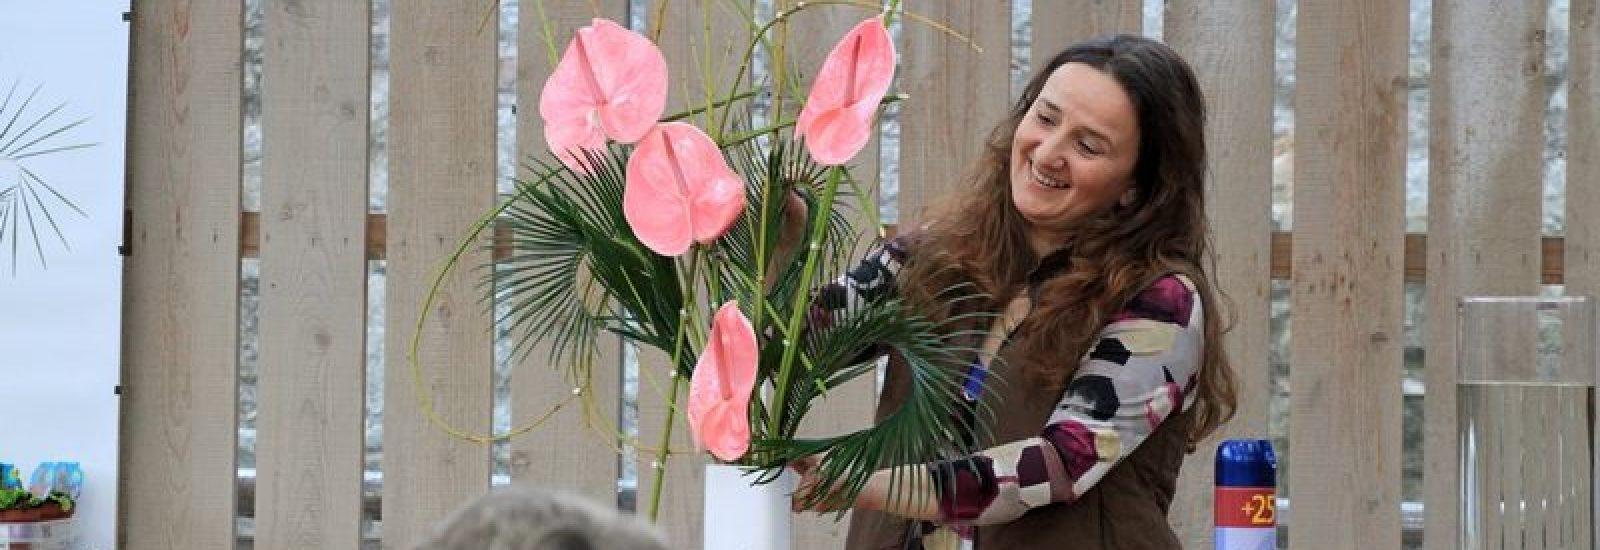 Celebrate wafa, the World Flower Show at Powerscourt Estate